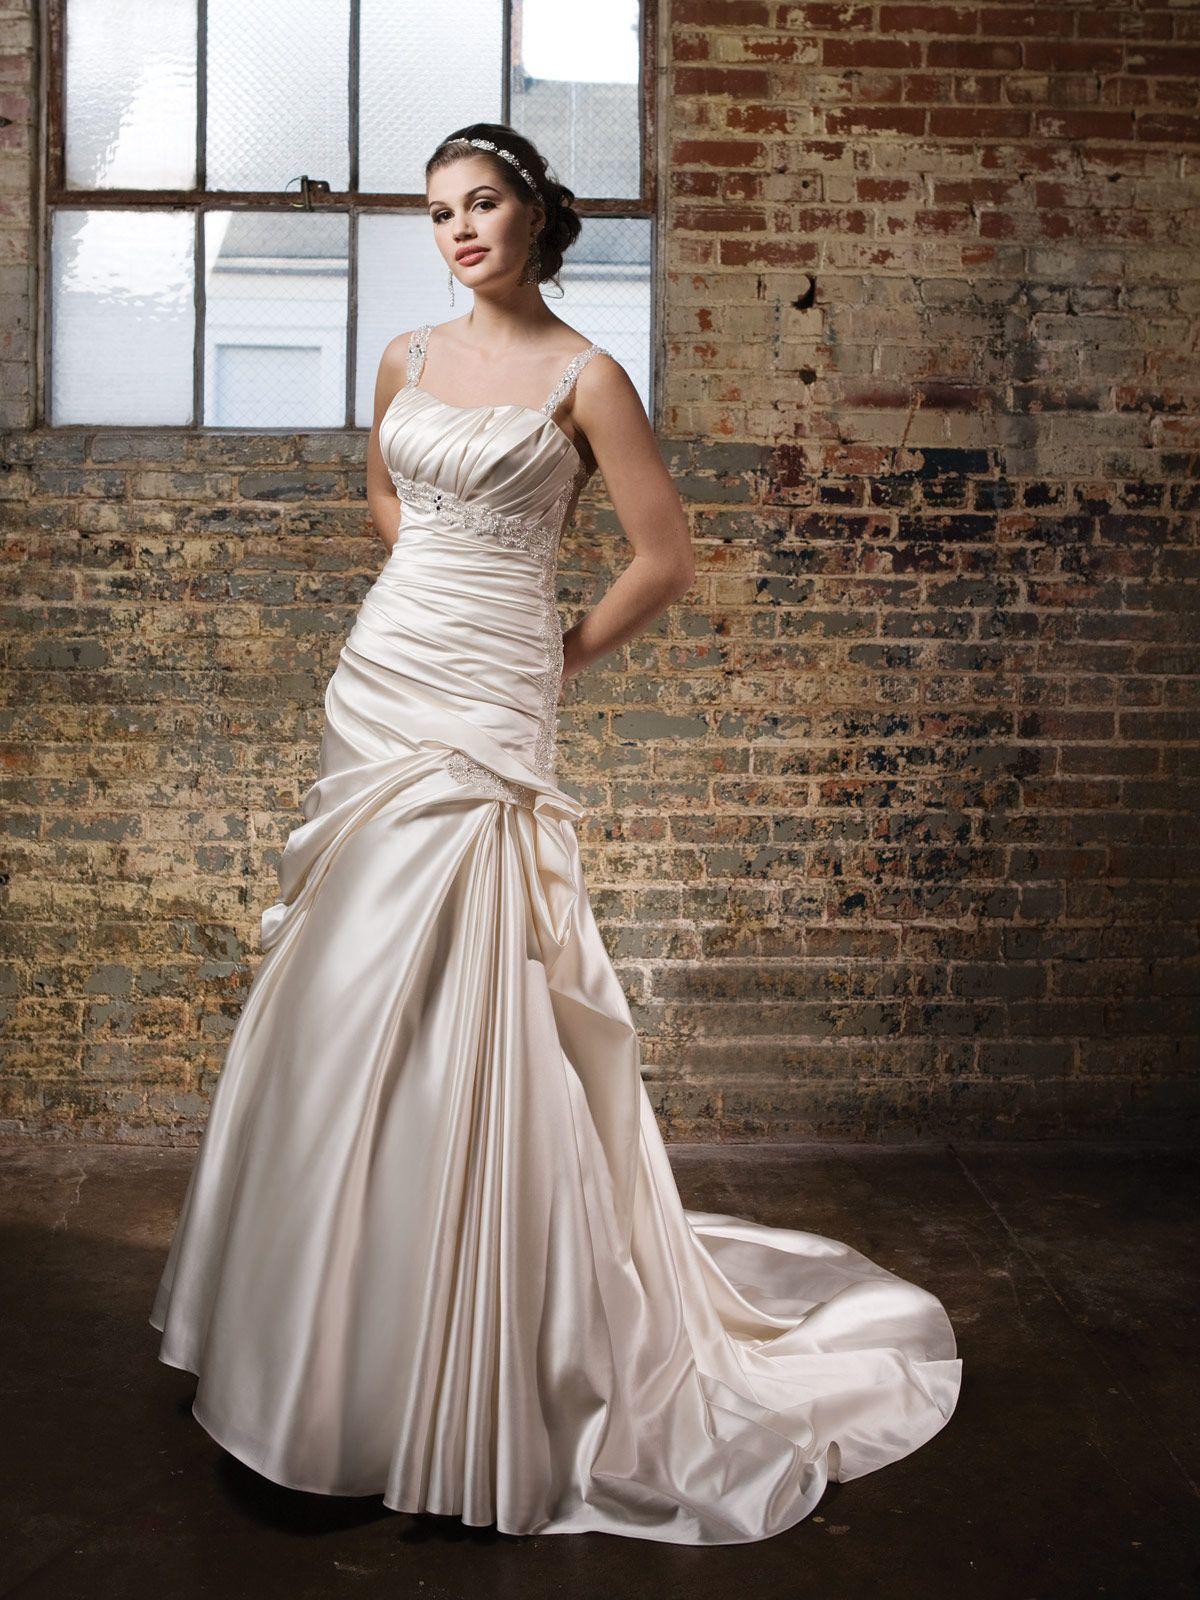 Where to find long sleeve wedding dresses  Square neck Aline satin bridal gown  dress  Pinterest  Bridal